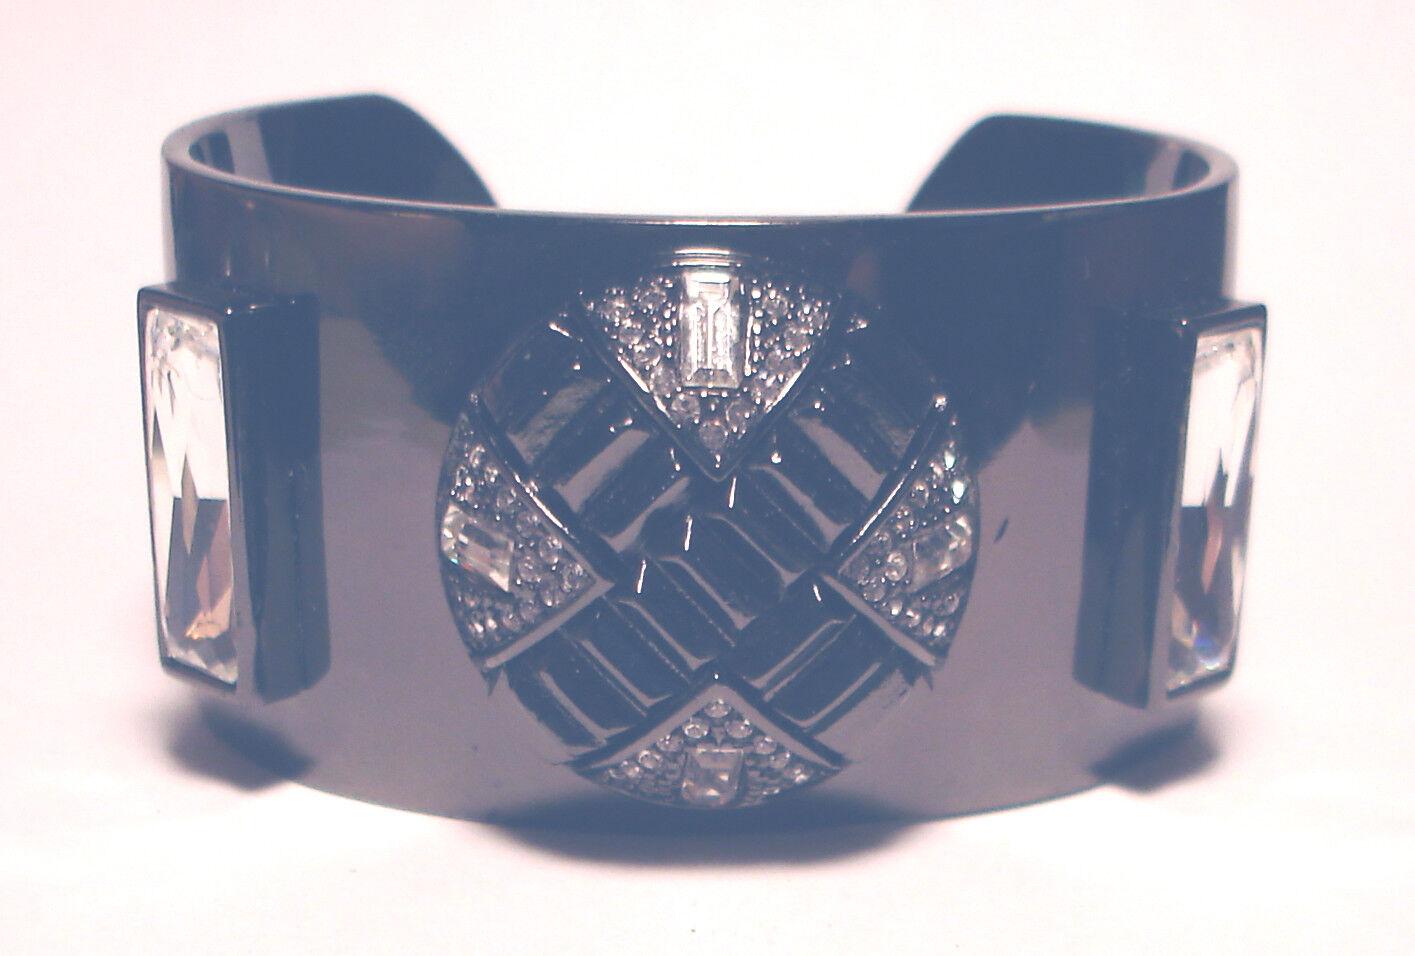 RARE Vintage 80's GIVENCHY Gunmetal STATEMENT Crystal COUTURE BRACELET France